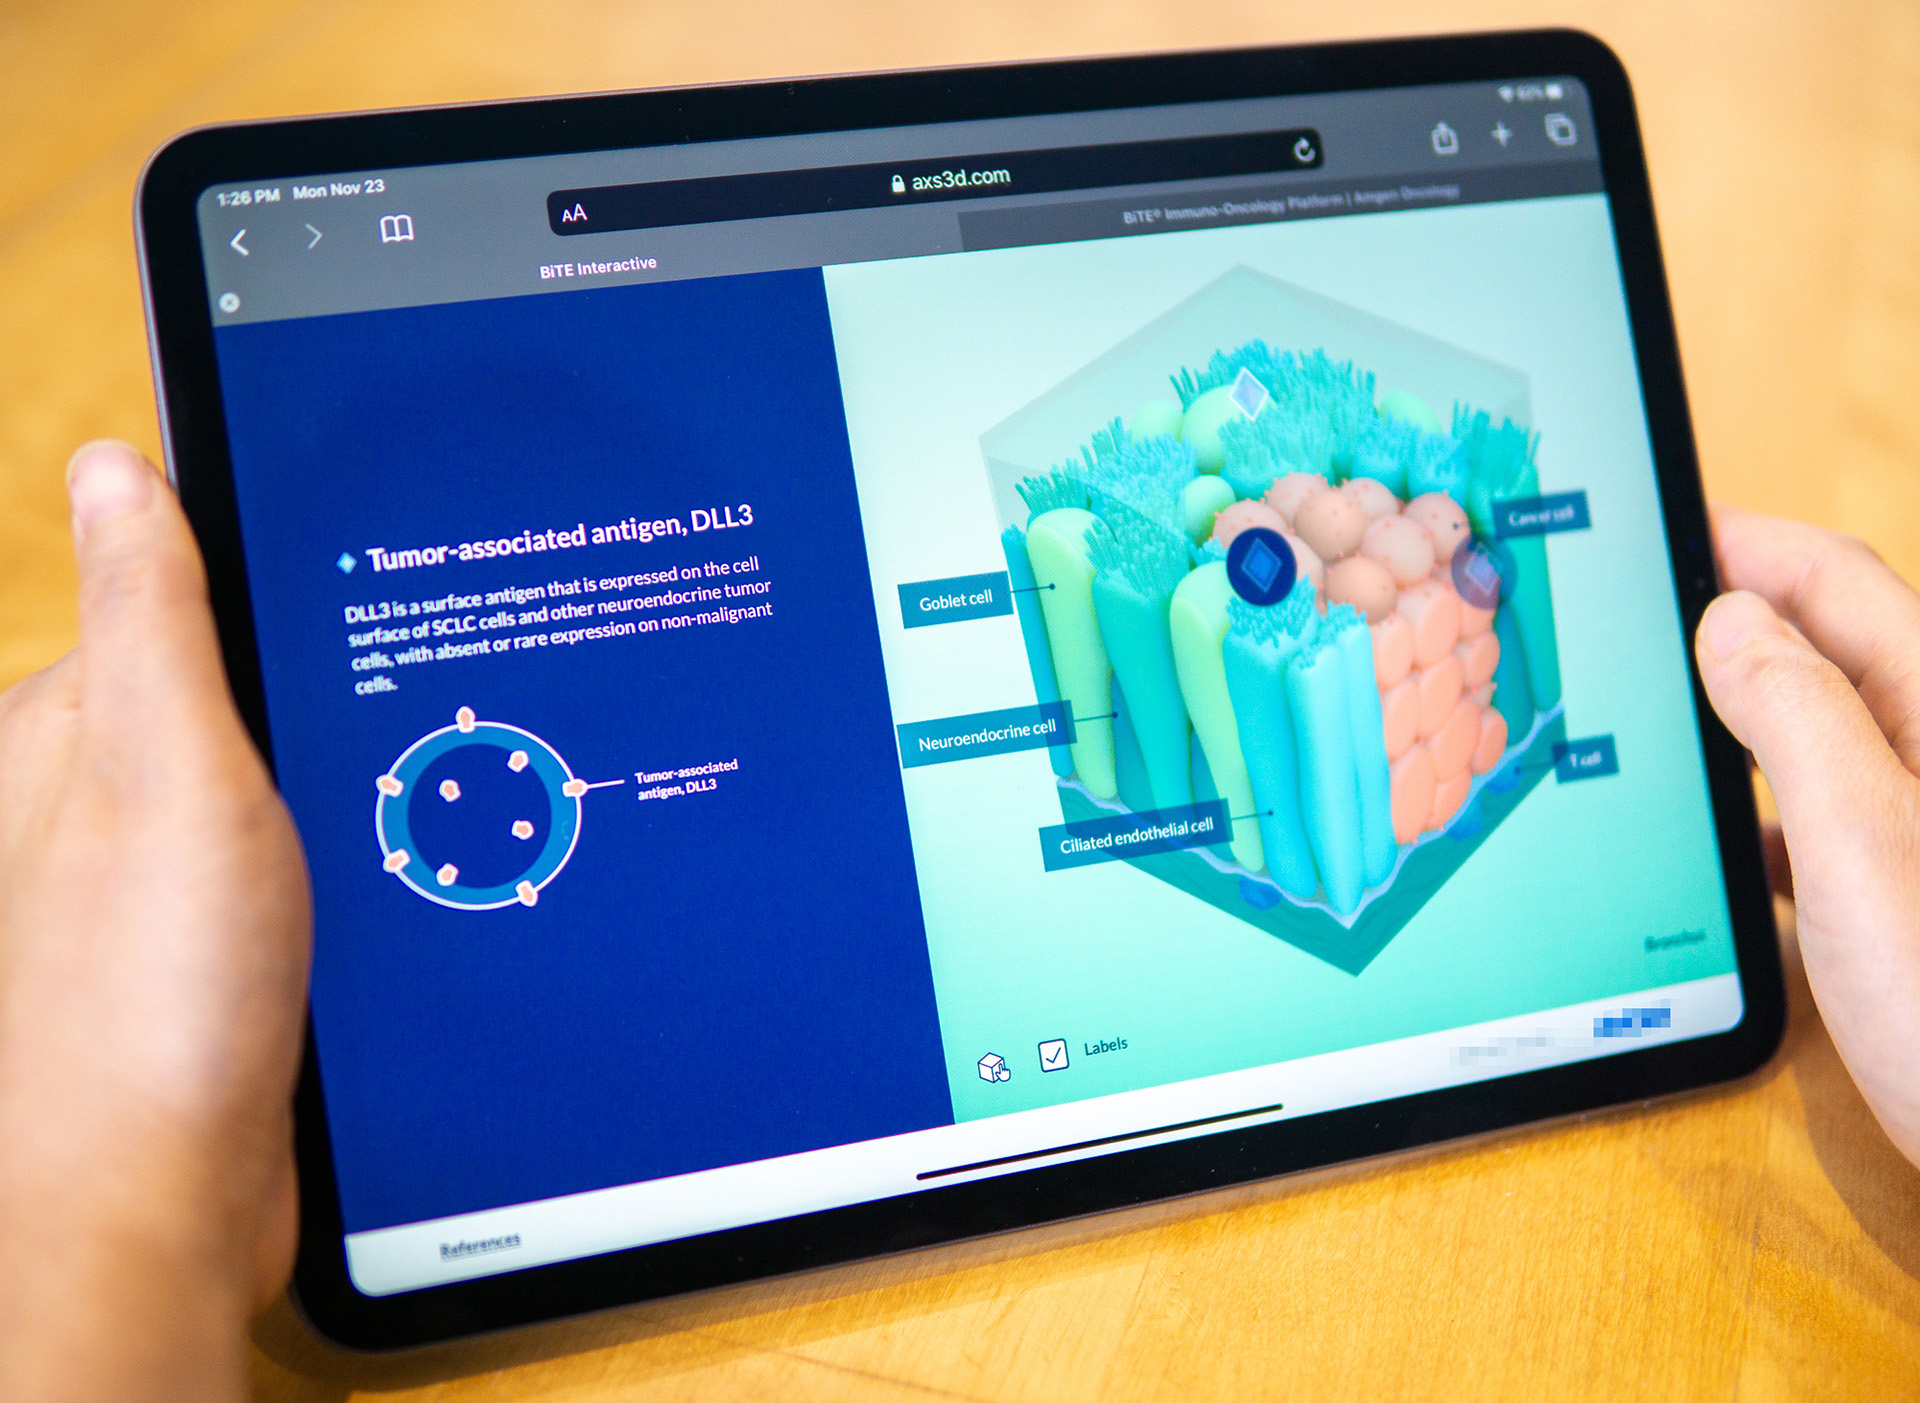 axs-studio-virtual-exhibit-oncology-interactive-05-drv-clean